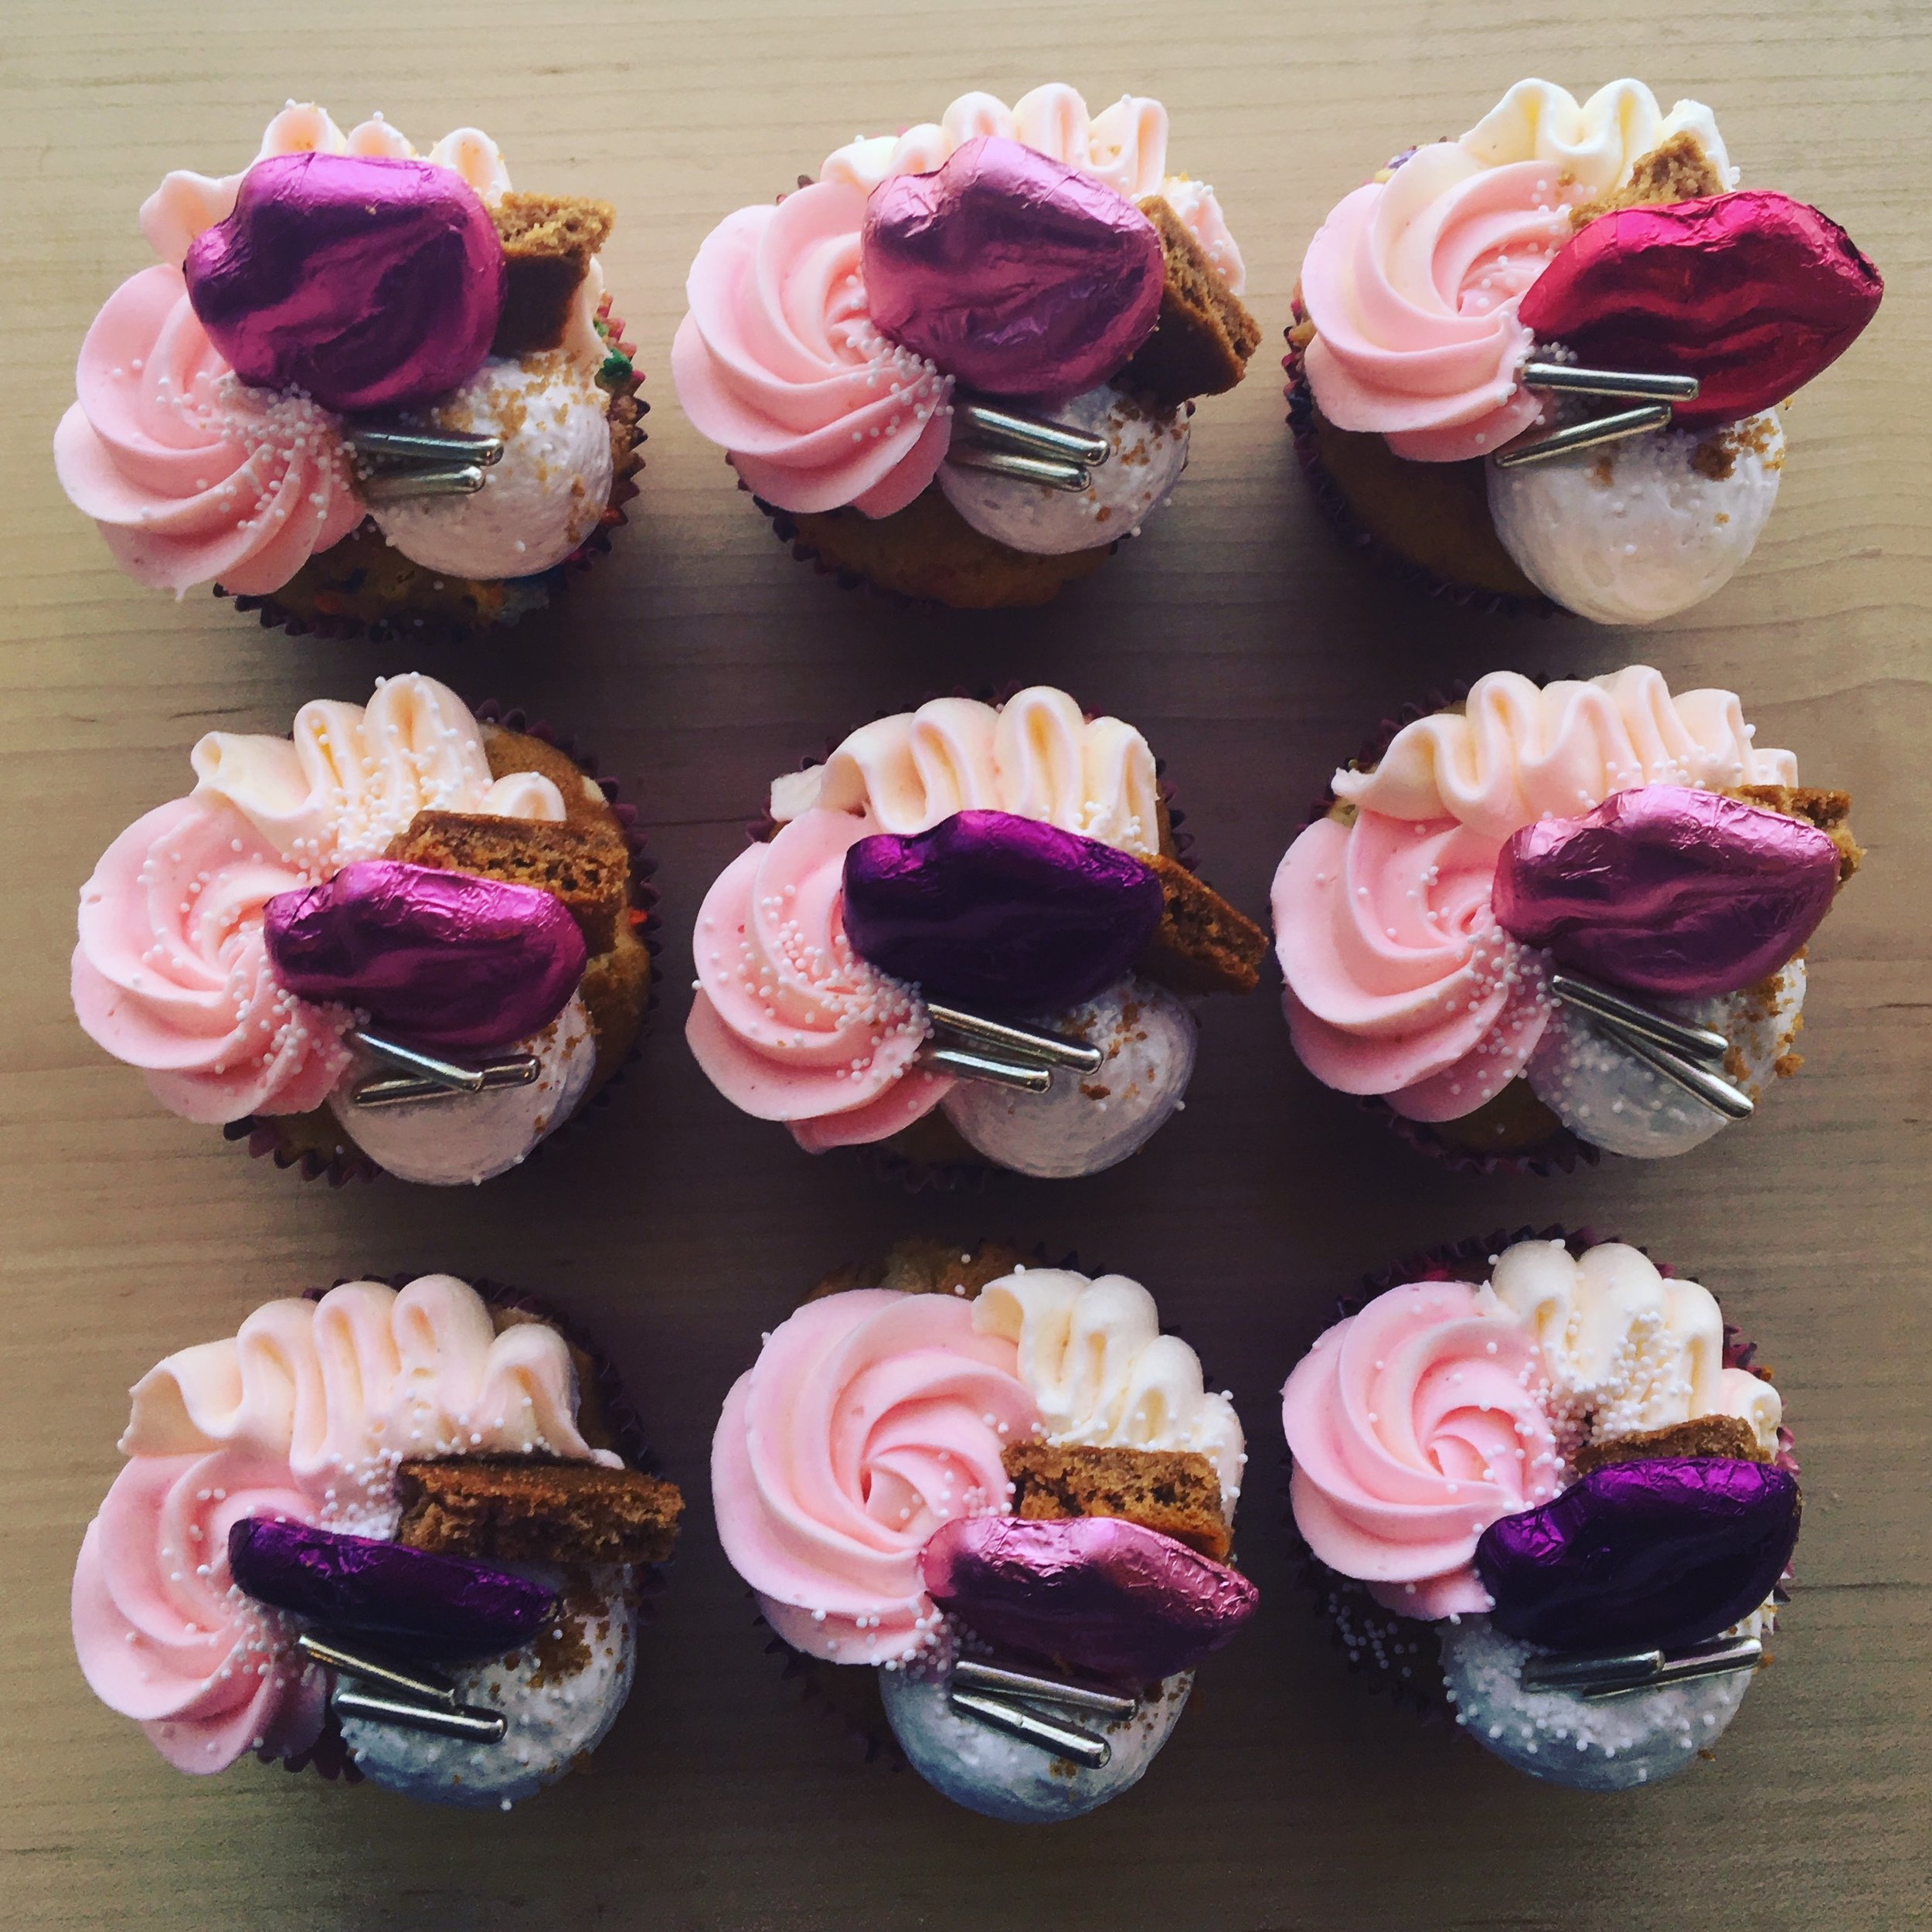 ECBG Cake Studio - custom cupcakes | Chicago Il.jpg